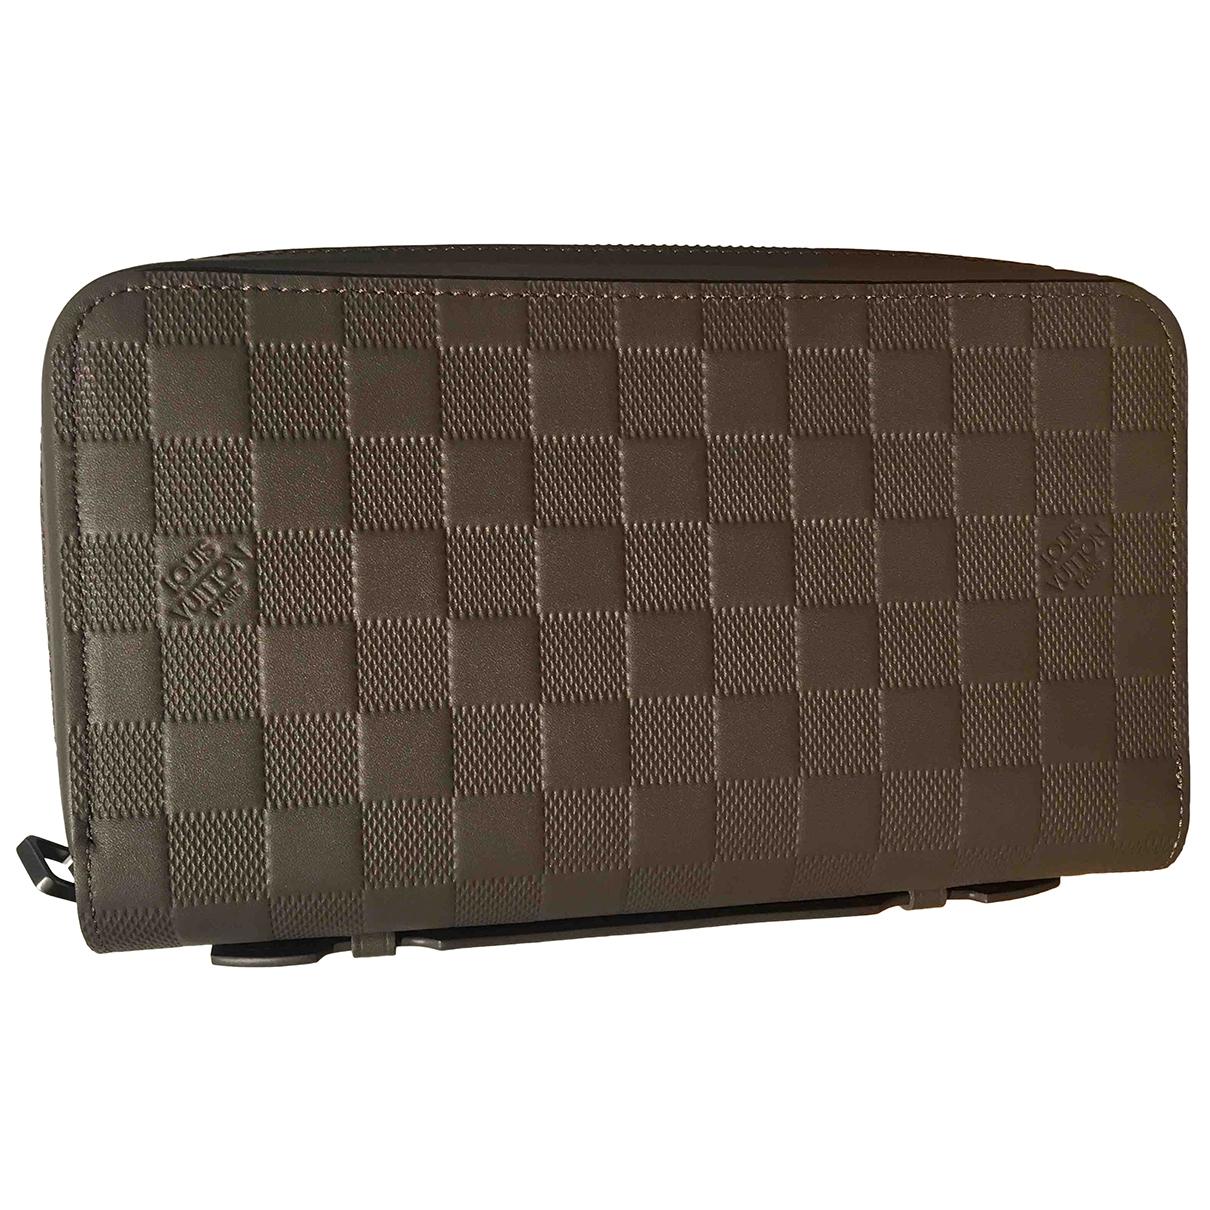 Marroquineria Zippy XL de Cuero Louis Vuitton